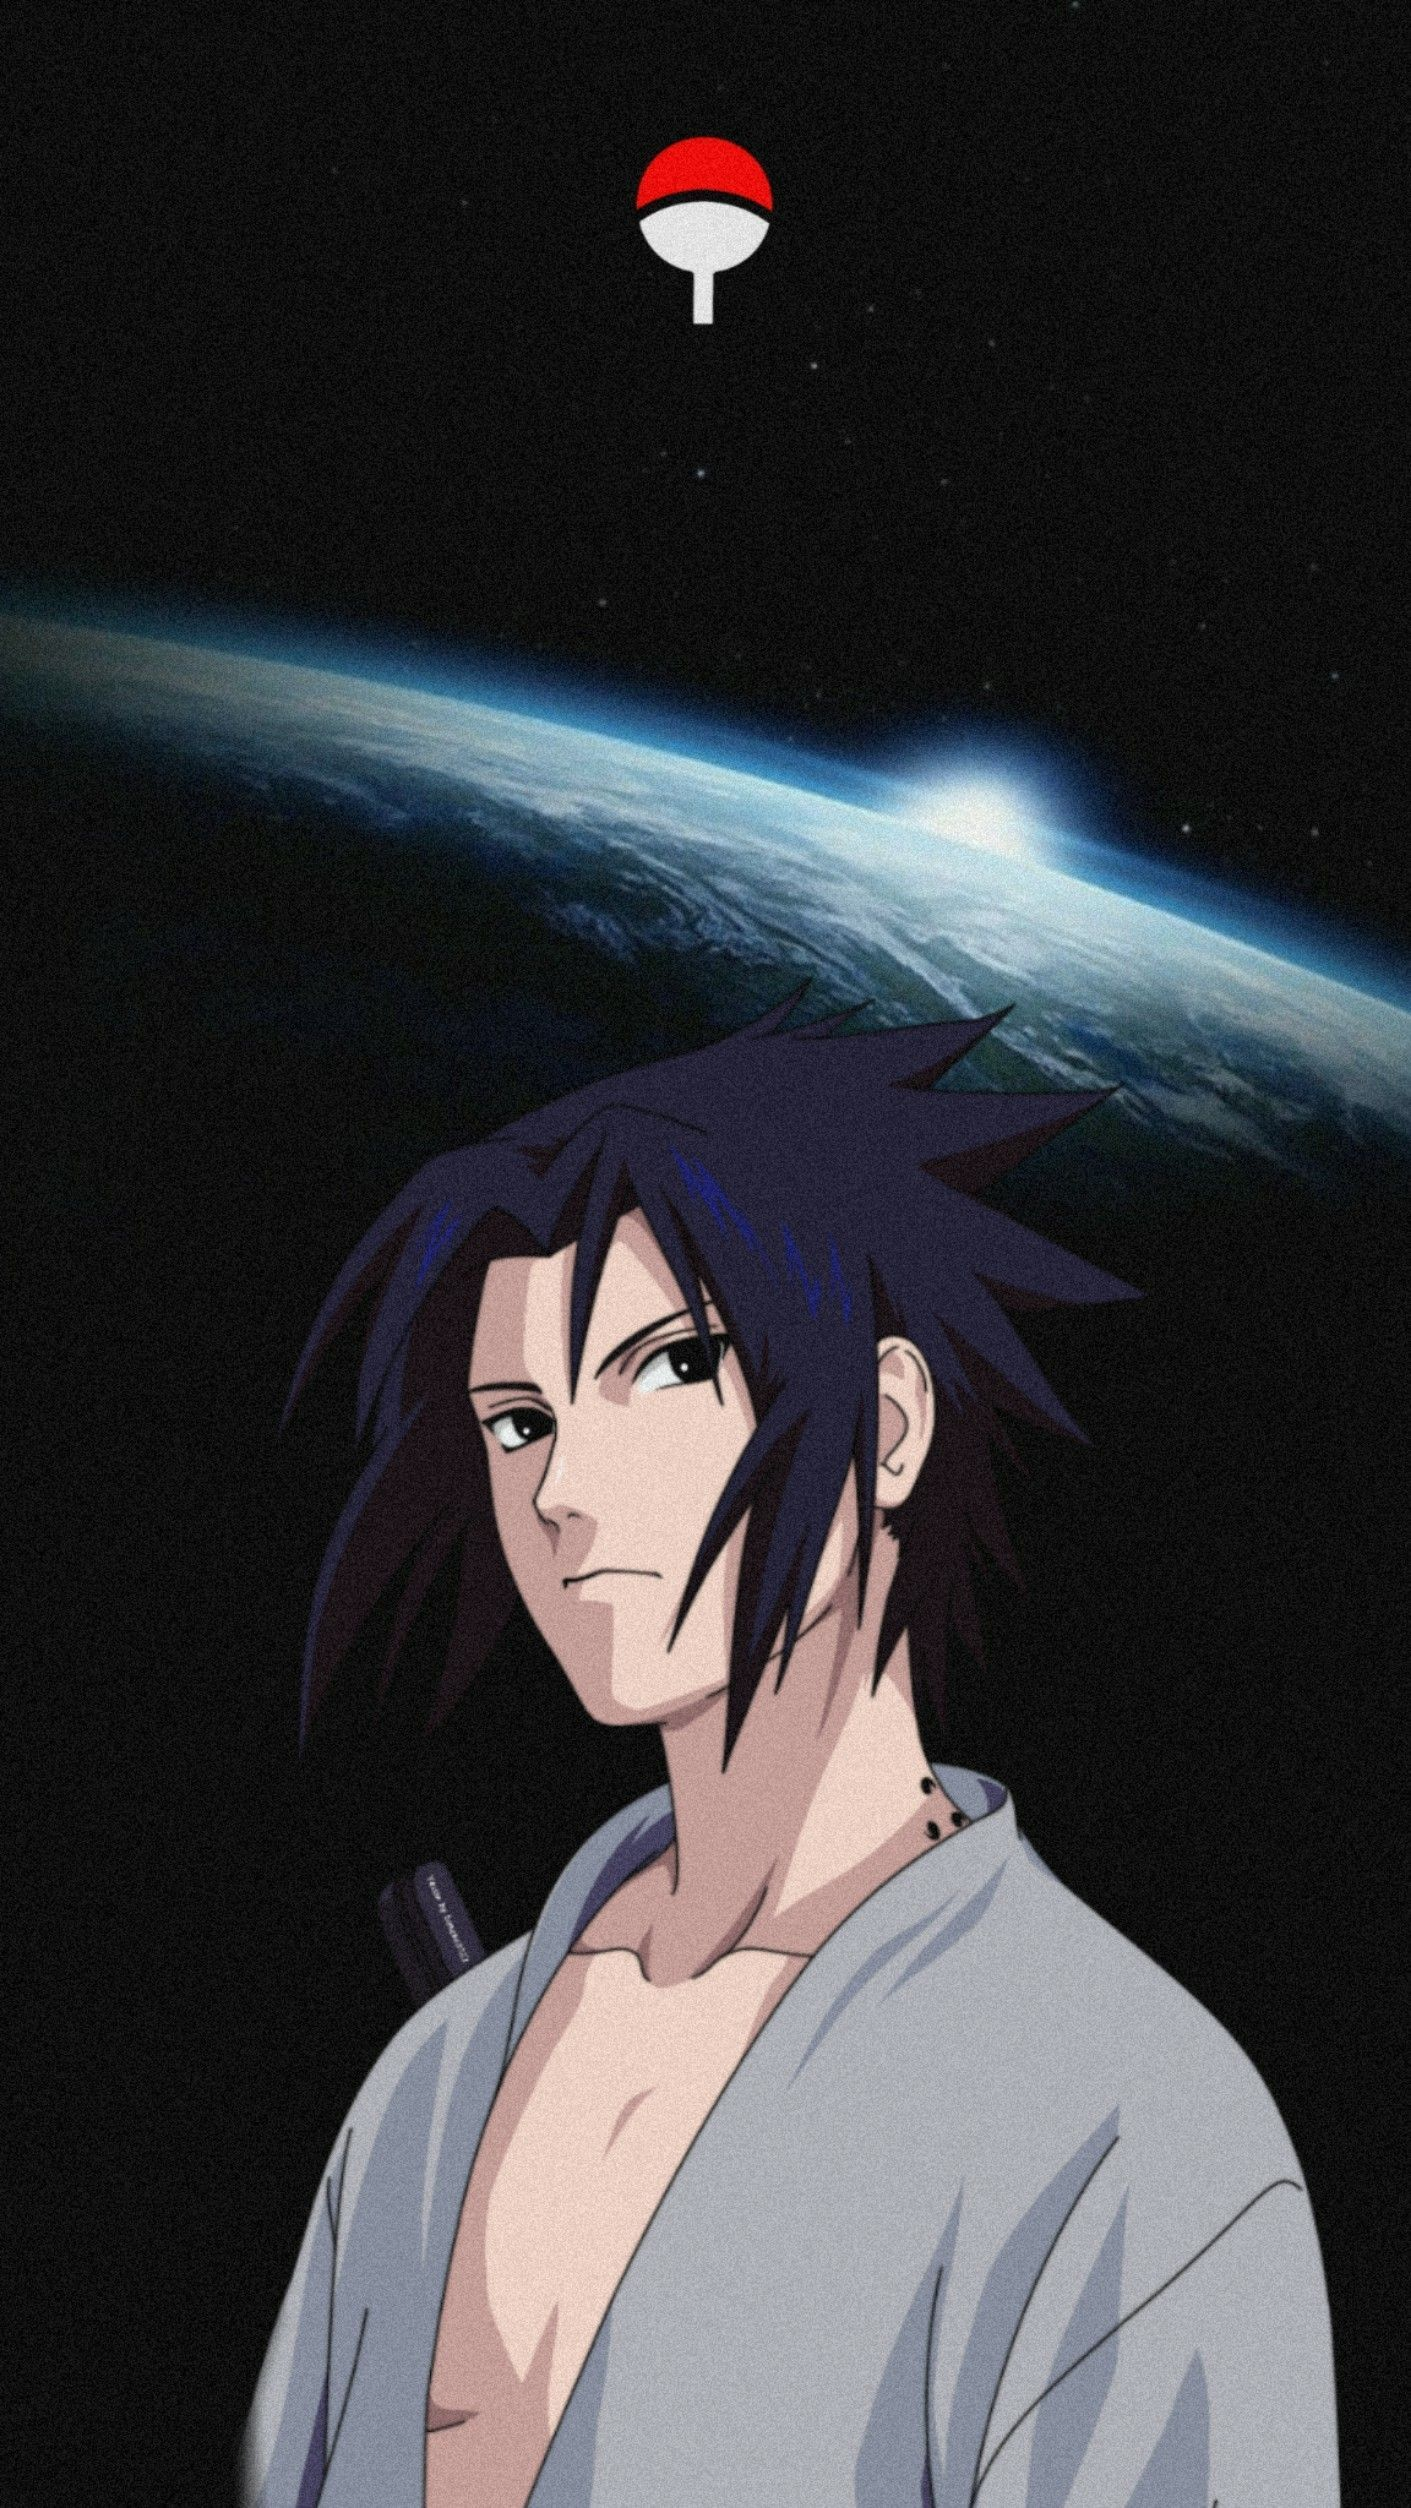 Sasuke Uchiha Wallpaper Hd Instagram Vargz7 Narutowallpaper Art Naruto Manga Naruto Sasuke Uchiha